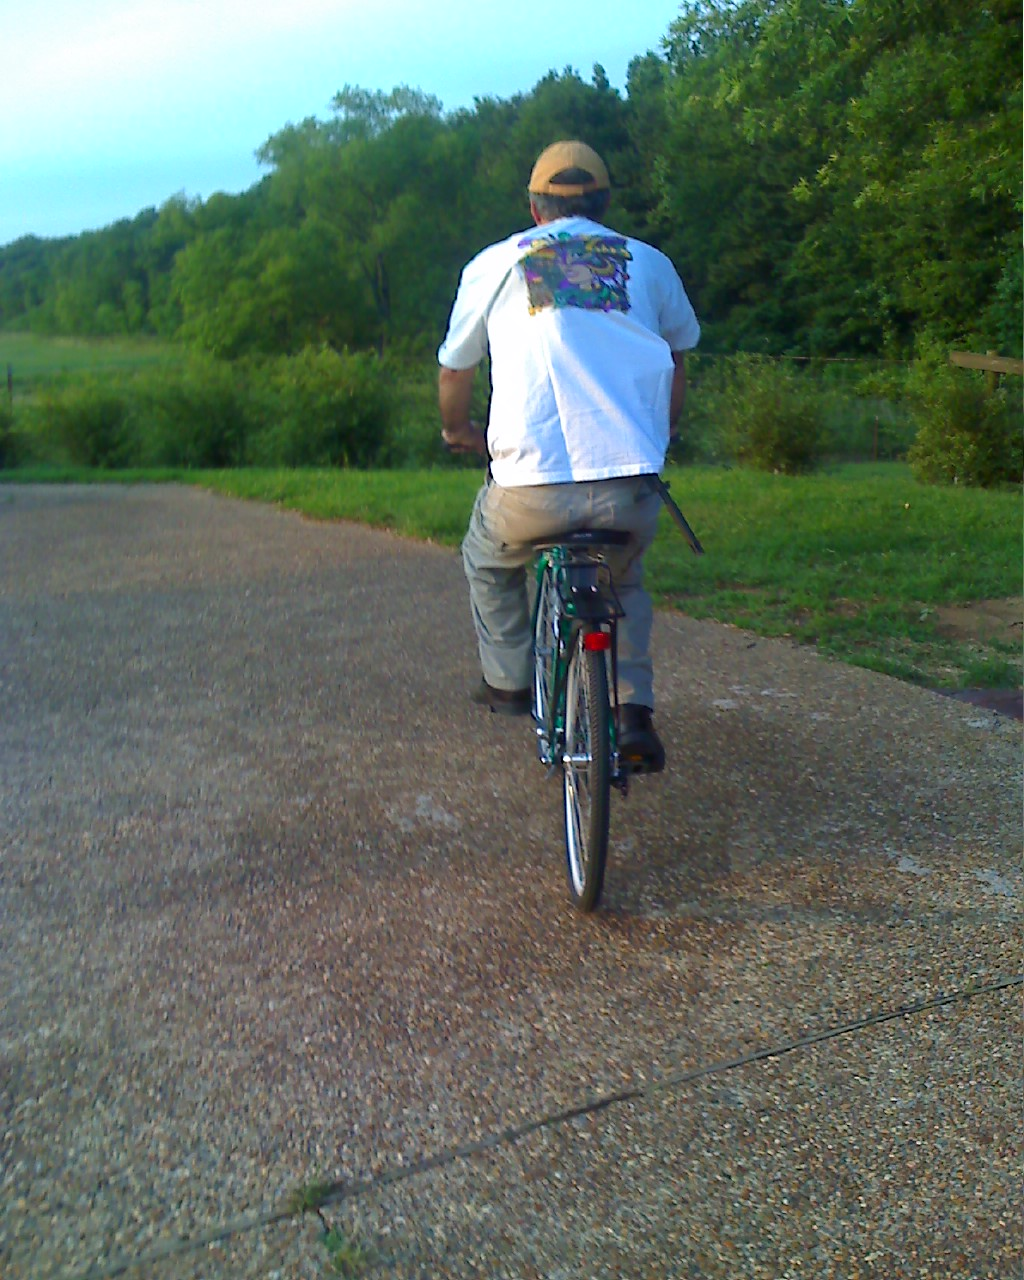 Bicycle riding and lurking BG's-defensive-bike-riding.jpg